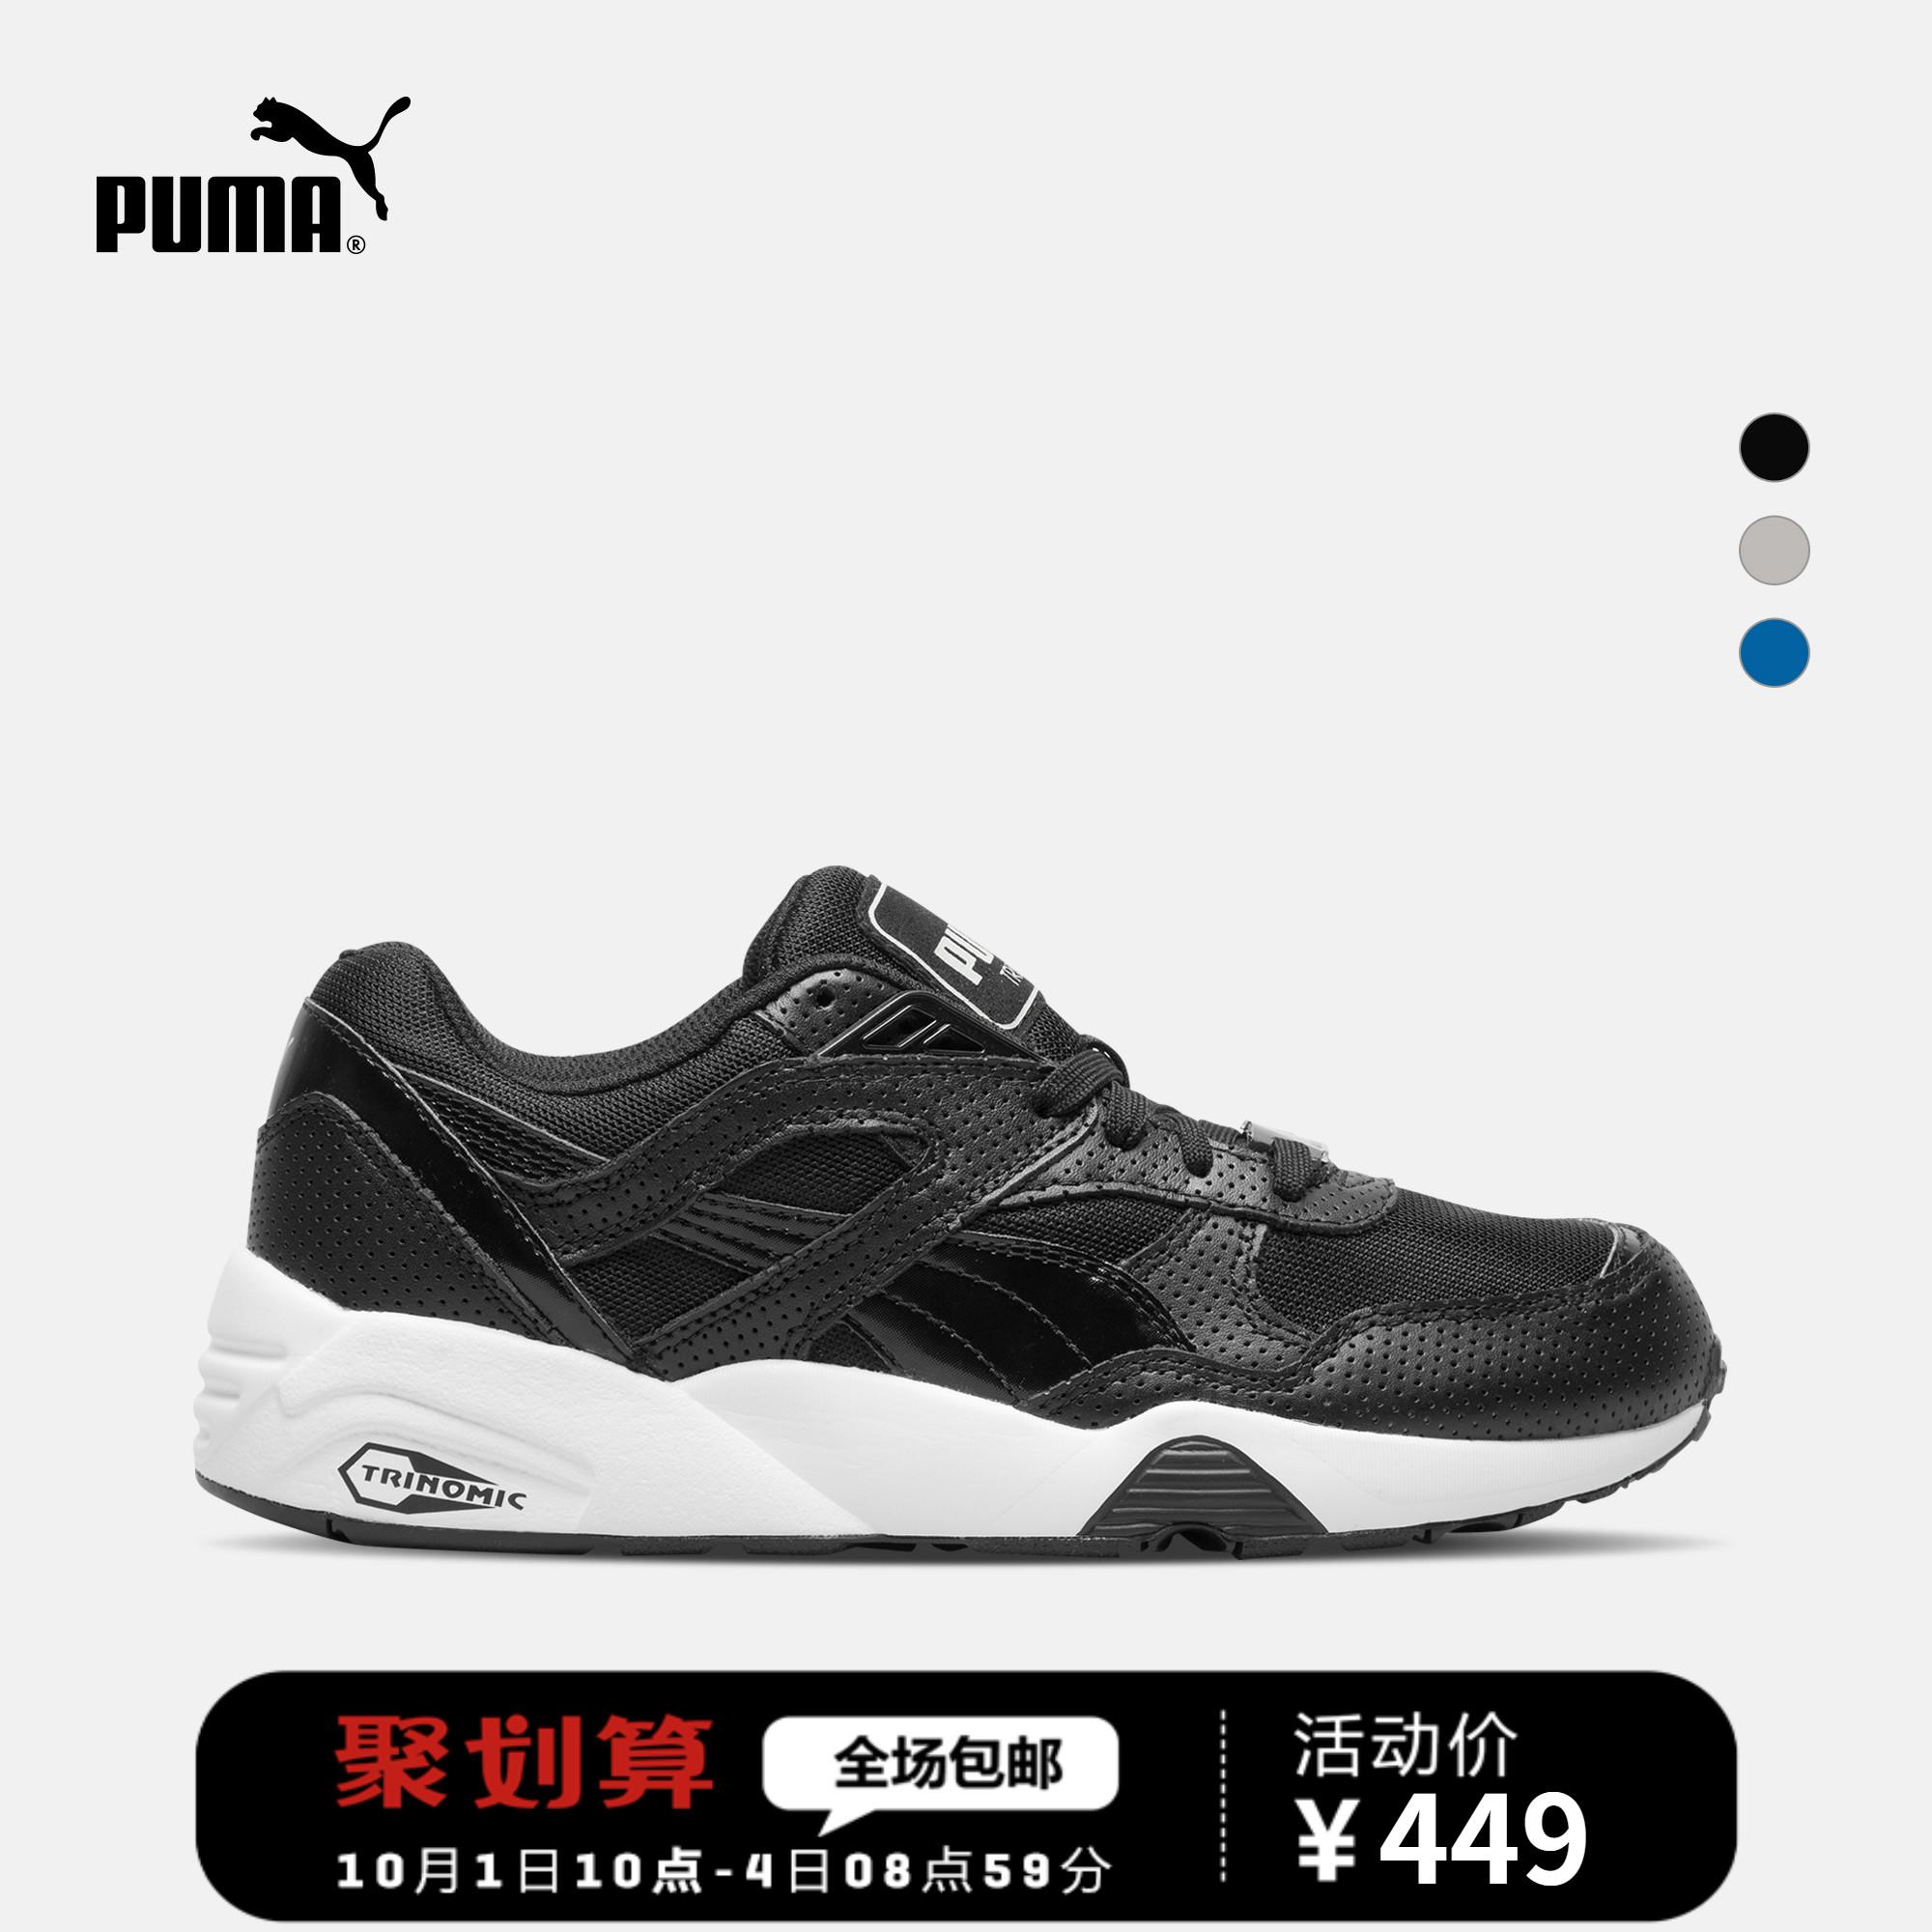 PUMA彪马官方 男女同款运动休闲鞋 R698 Breathe 362573